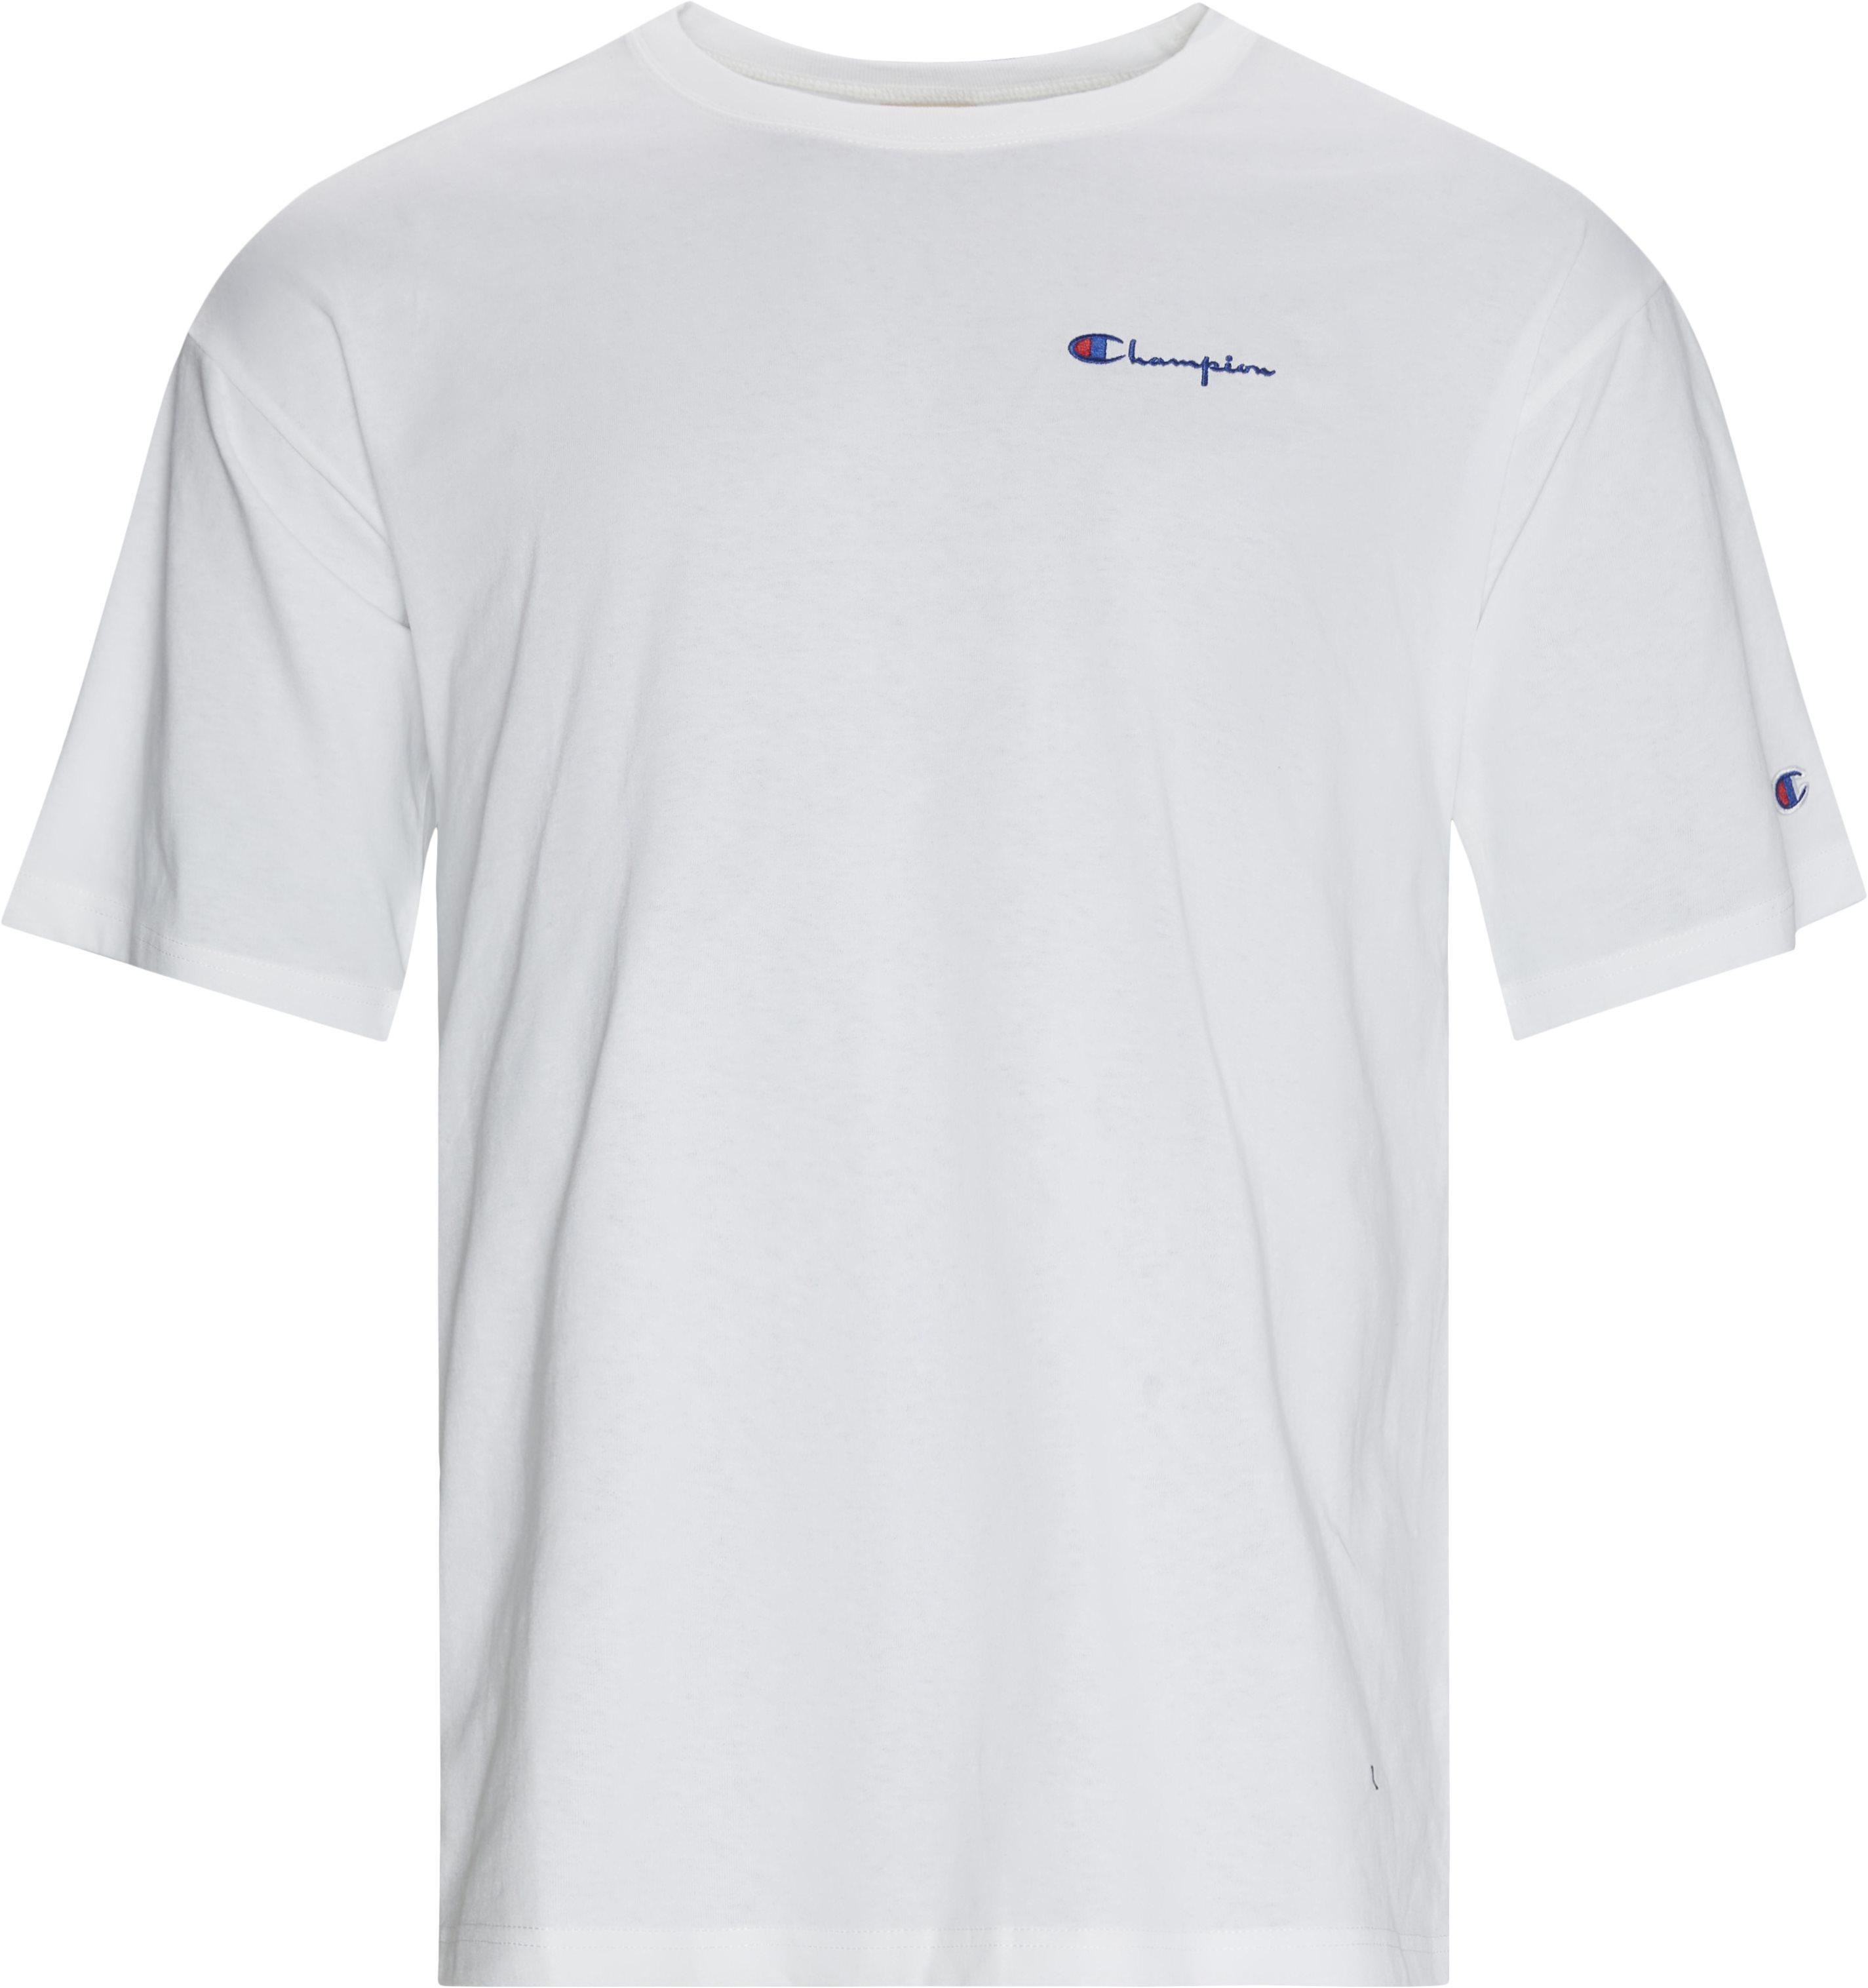 Drop Tee - T-shirts - Regular fit - Hvid